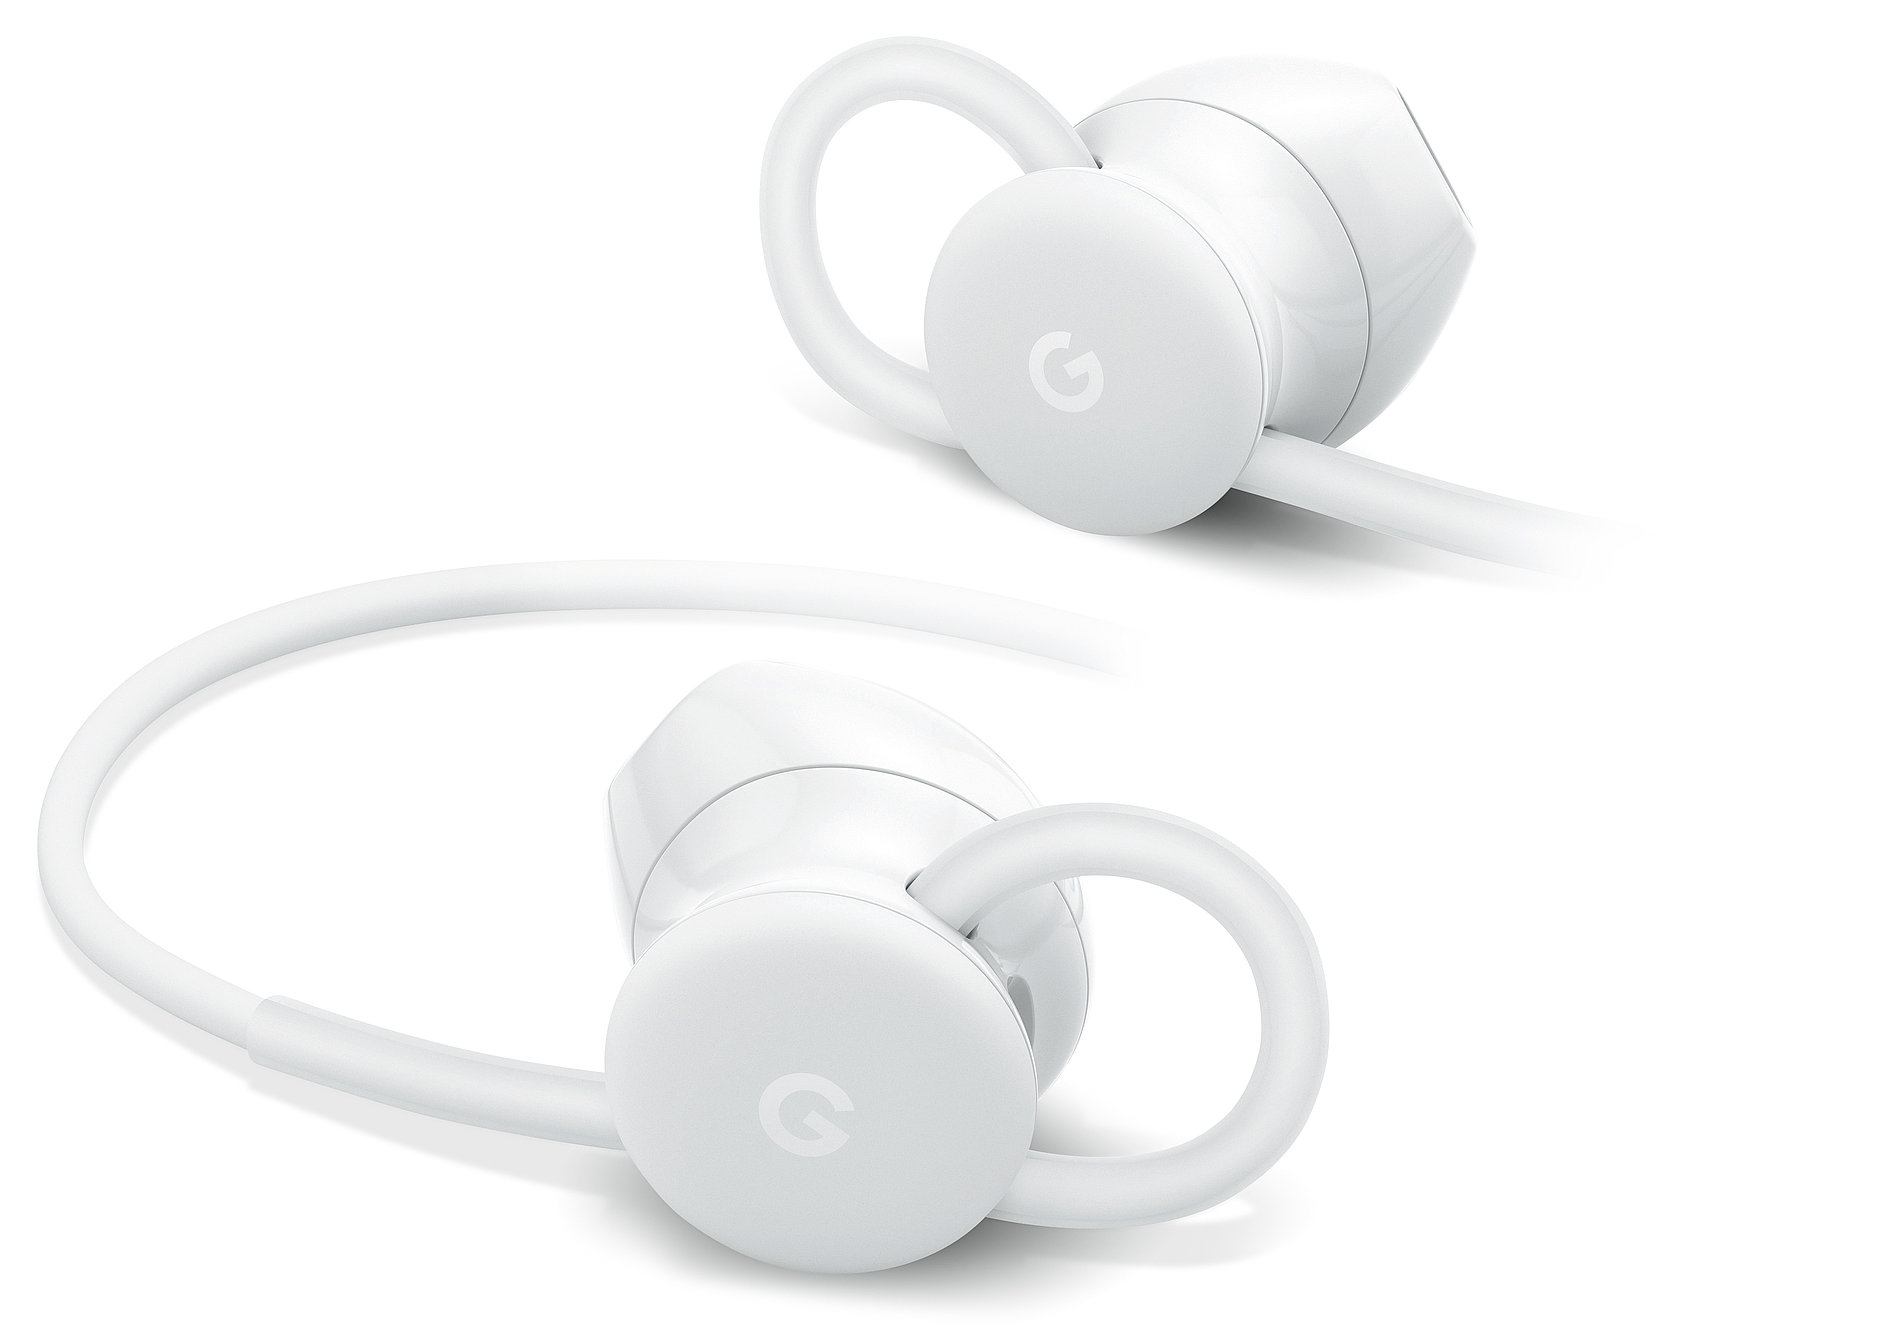 Google Pixel USB-C Earbuds | Red Dot Design Award